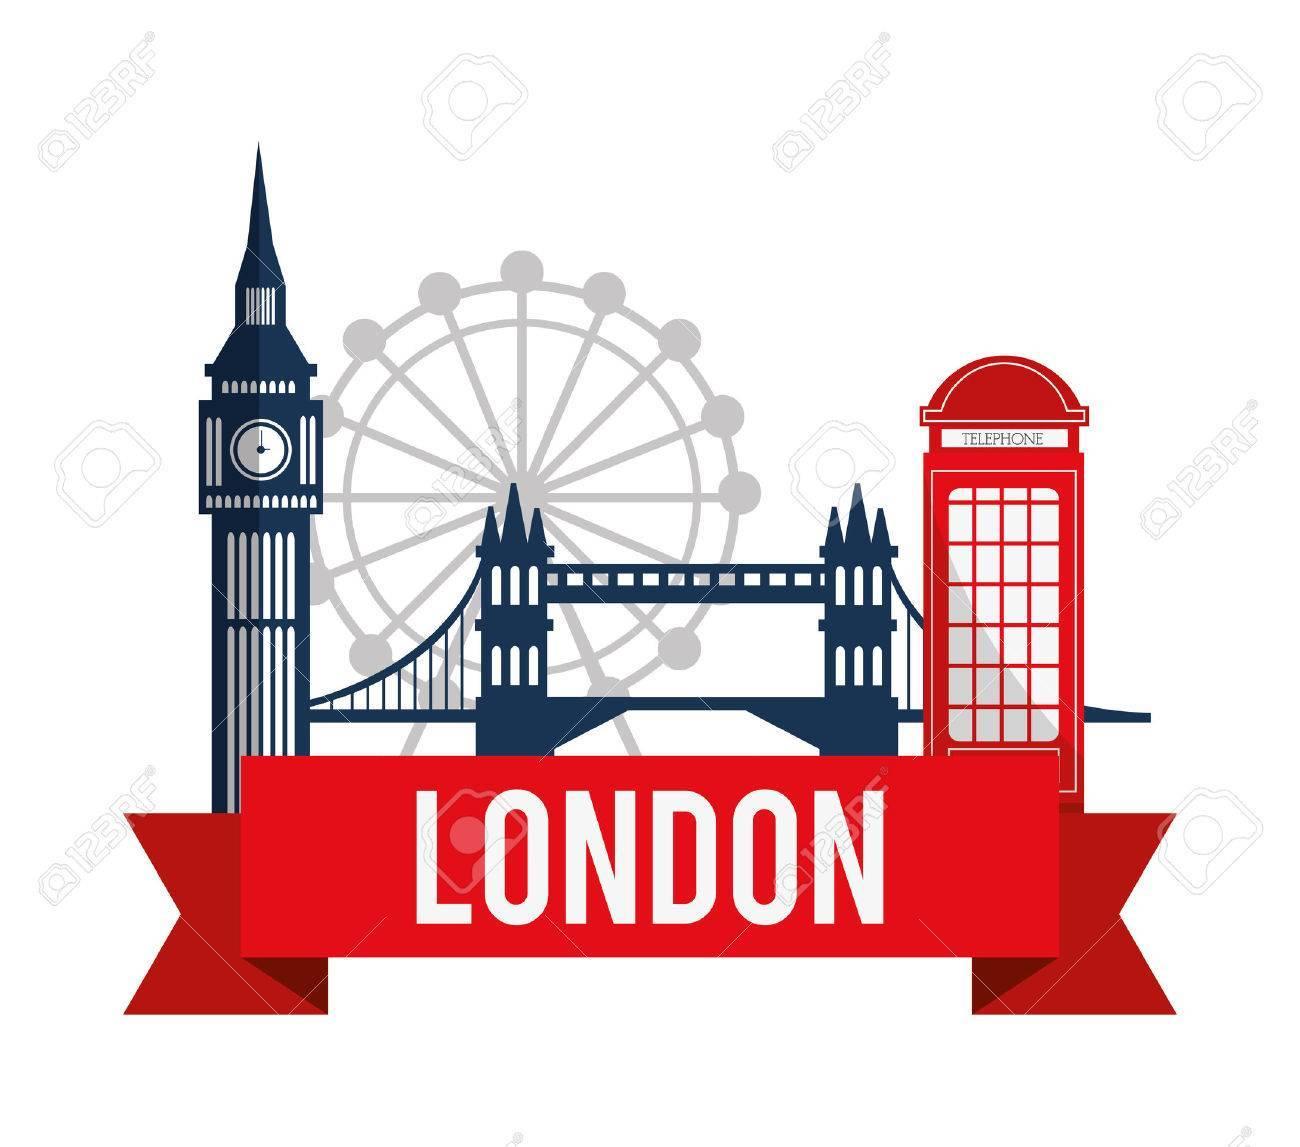 Clipart london » Clipart Portal.